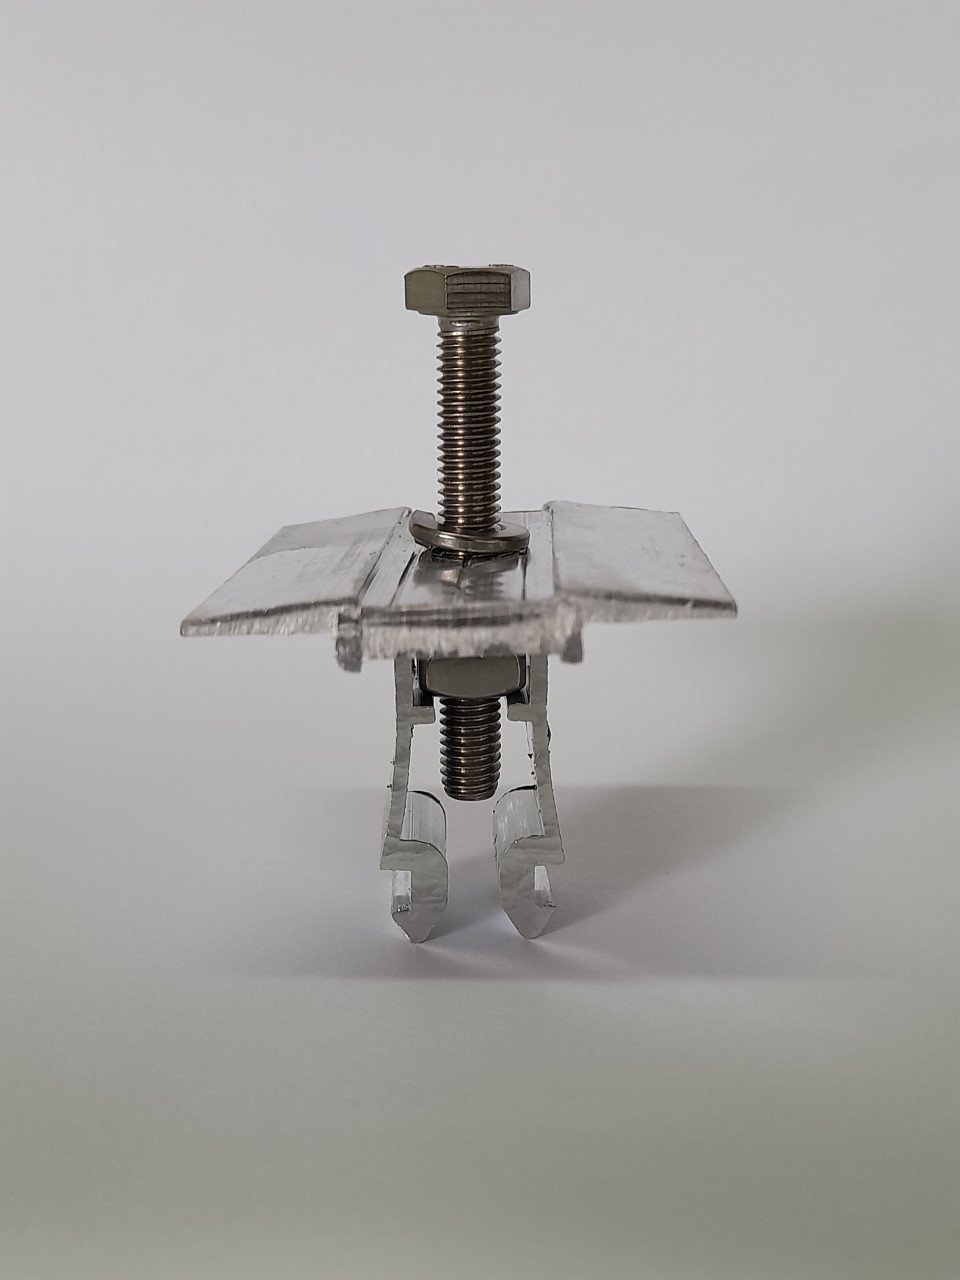 Fixador  V Intermediário P/ Painéis Solares- Middle Clamp c/ 8un